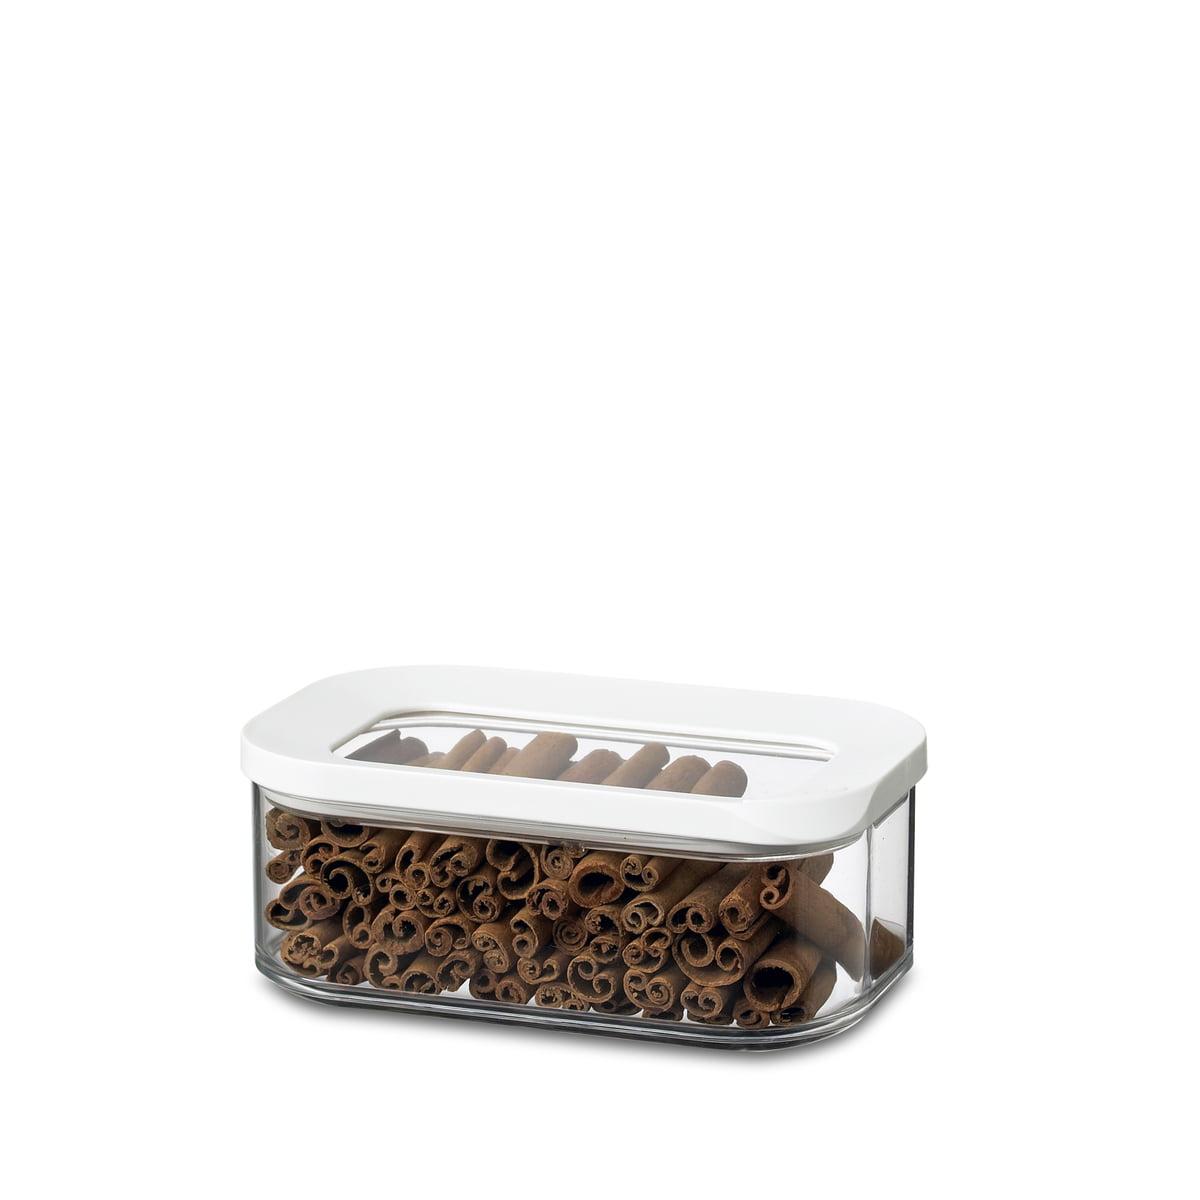 modula storage boxes rosti mepal shop. Black Bedroom Furniture Sets. Home Design Ideas